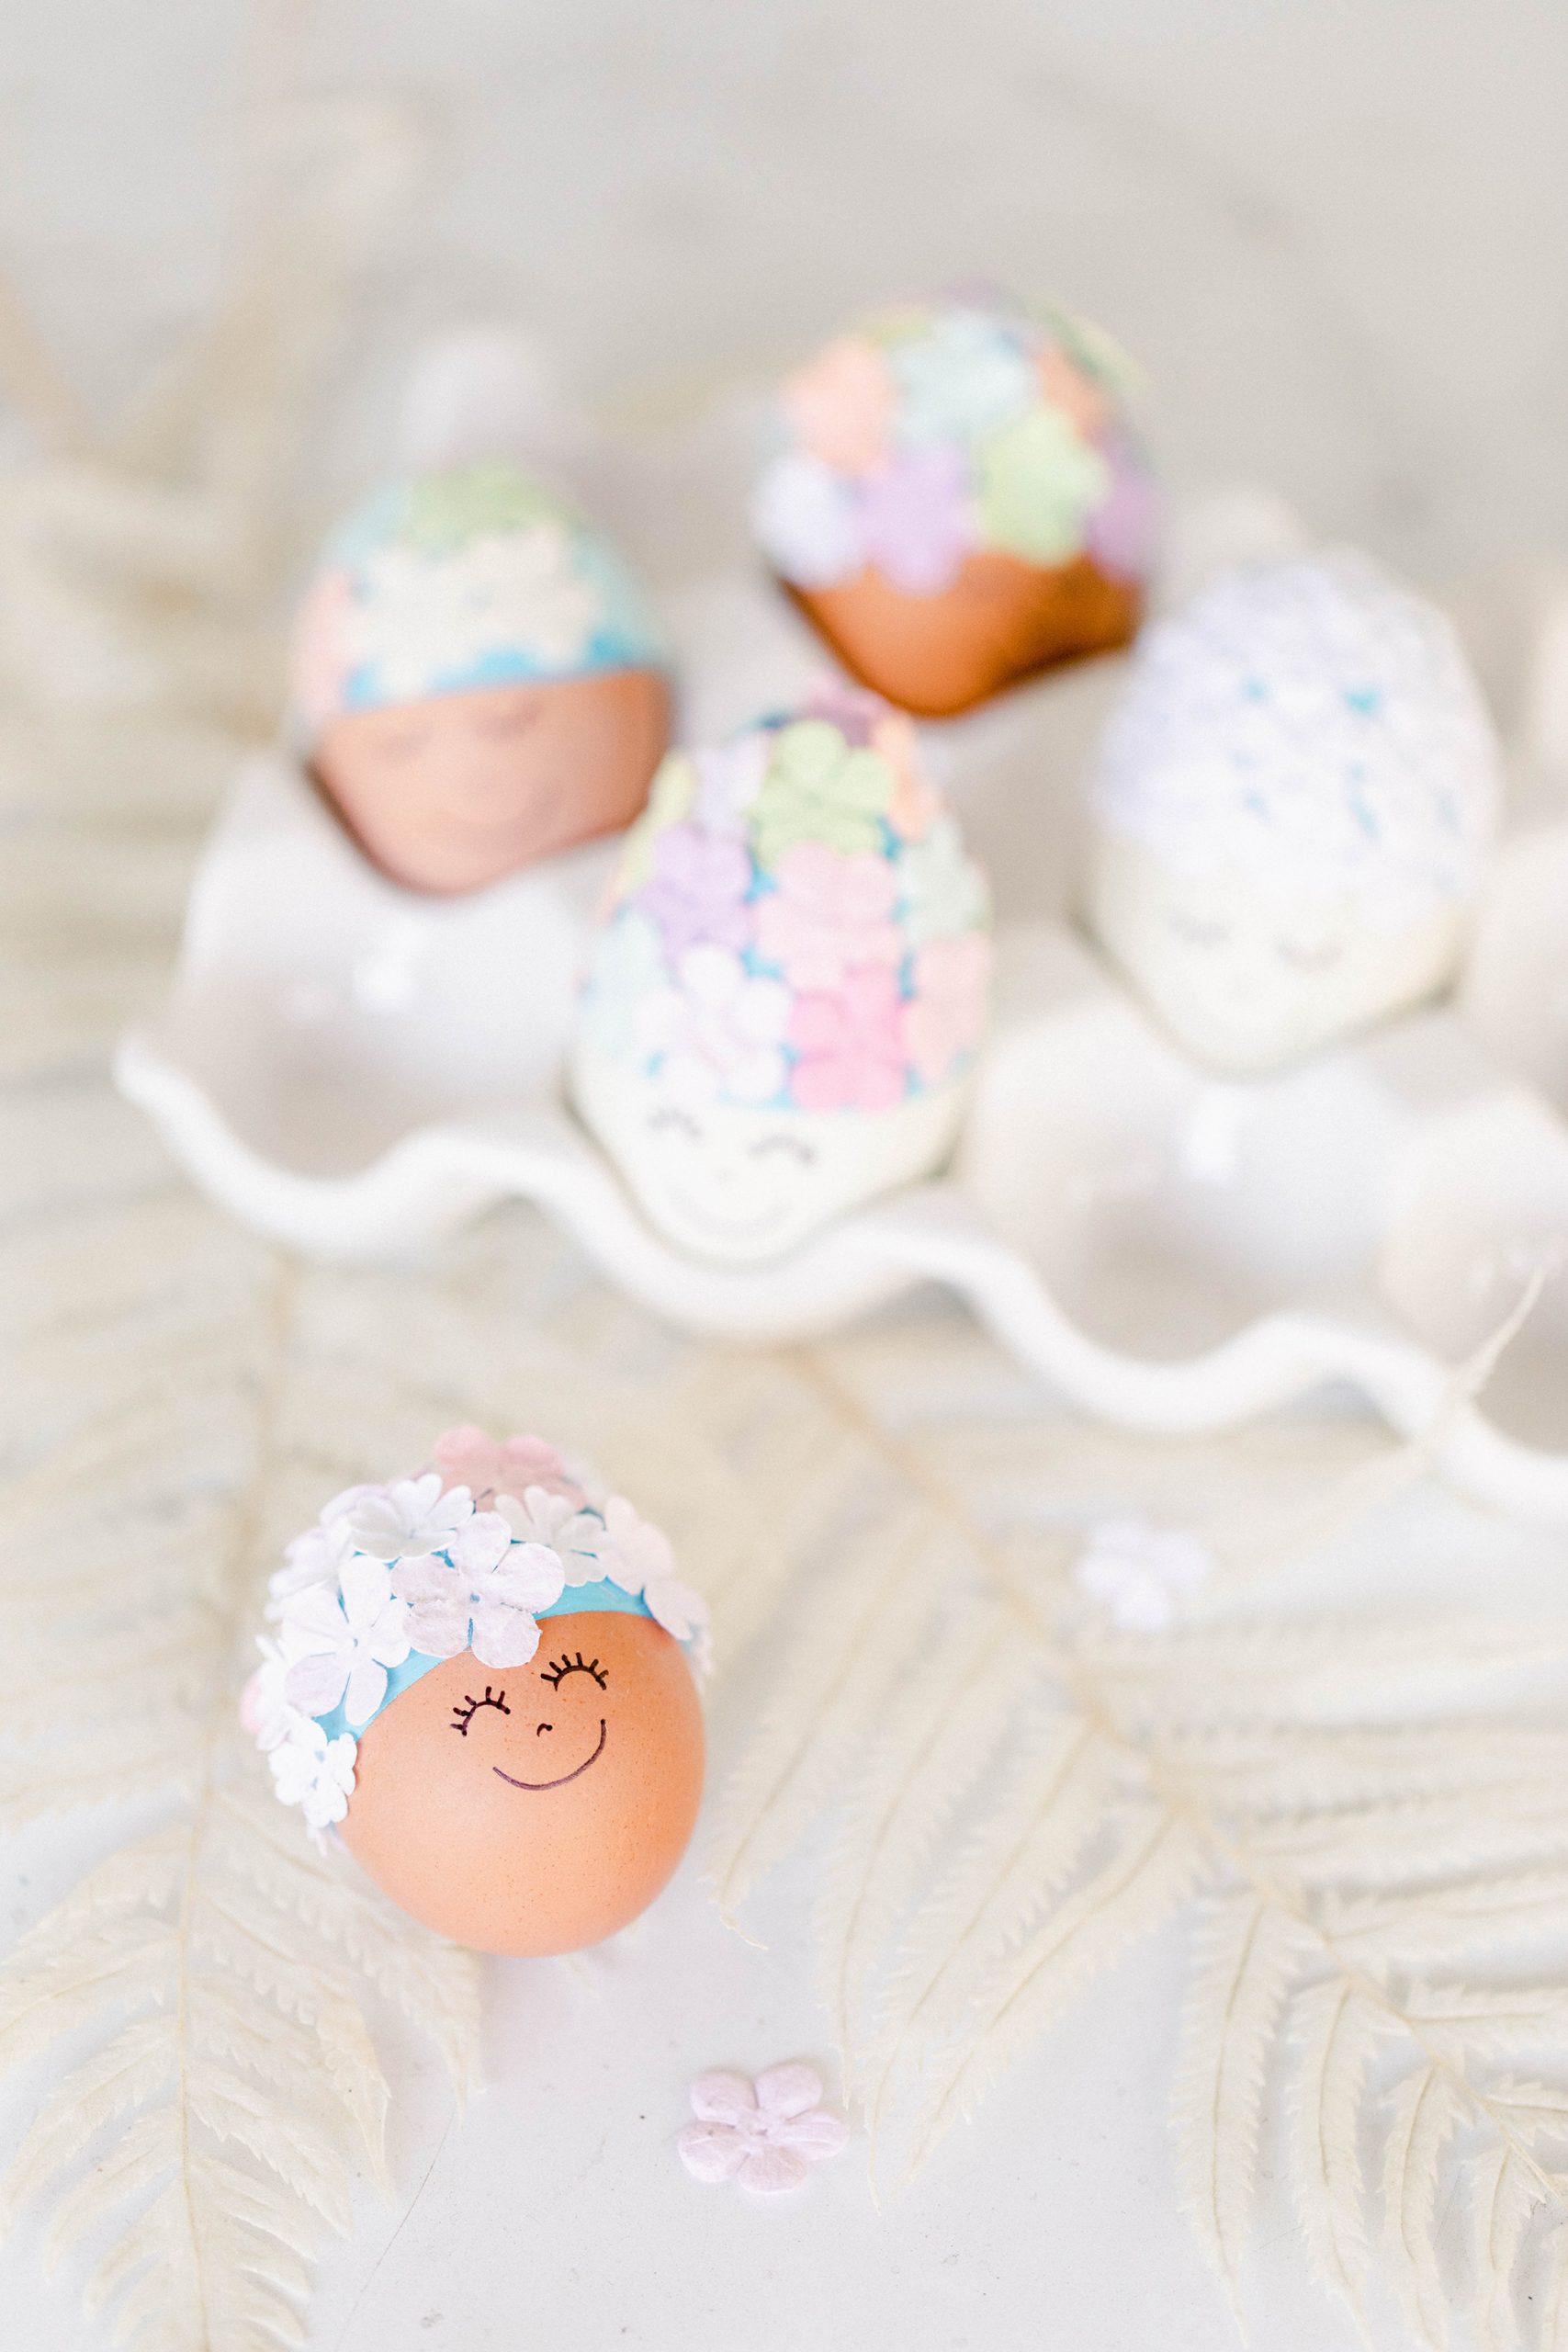 DIY Bathing Beauty Easter Eggs